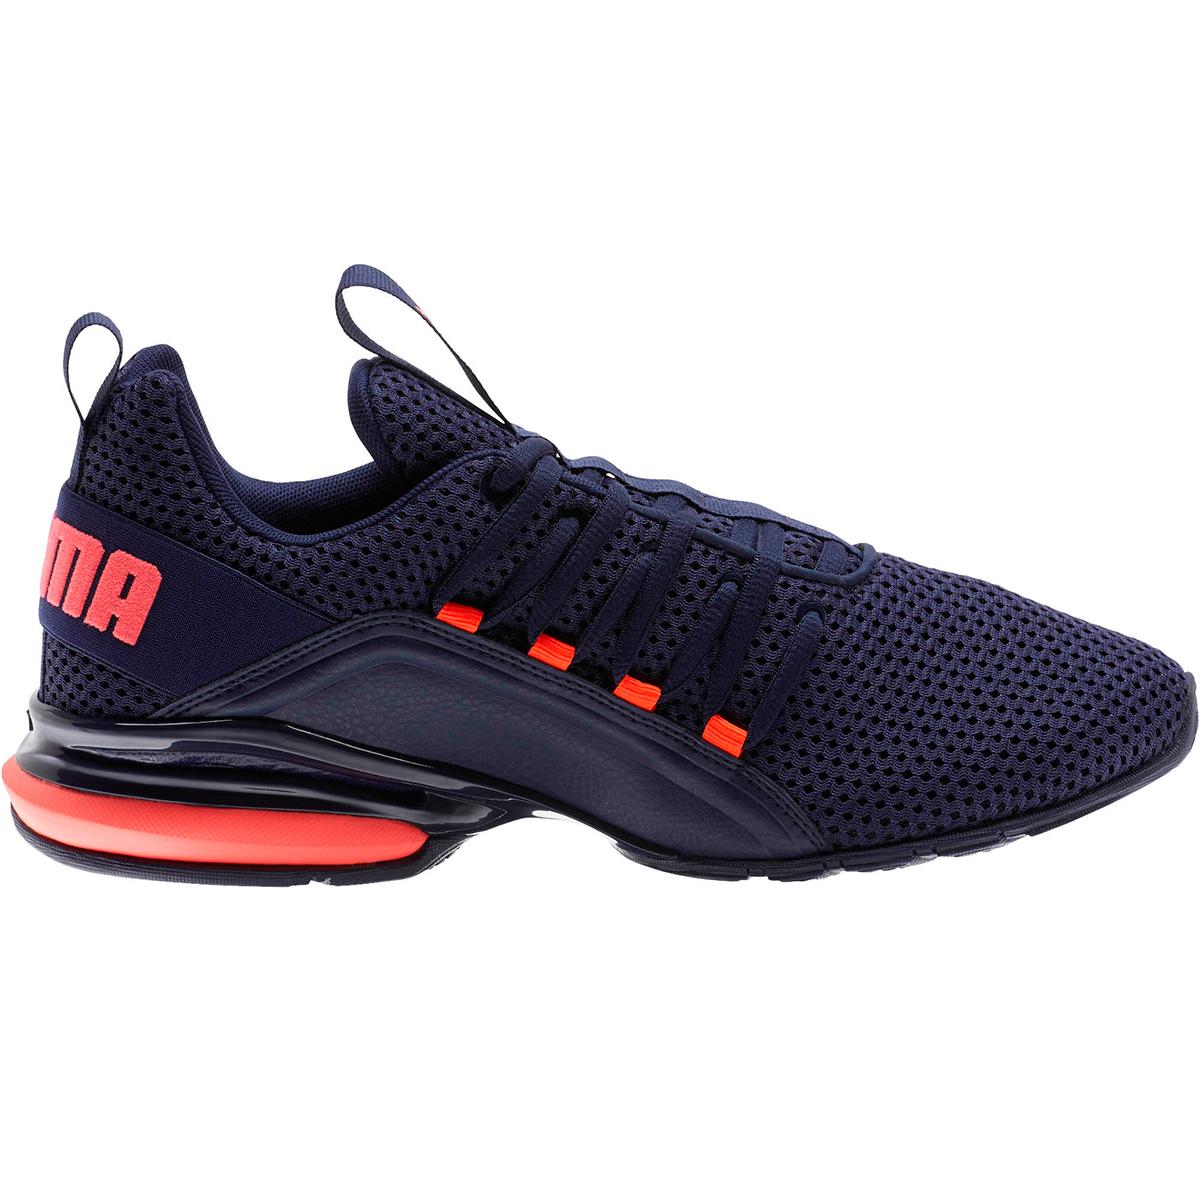 Puma Men's Axelion Breathe Training Shoes - Black, 12